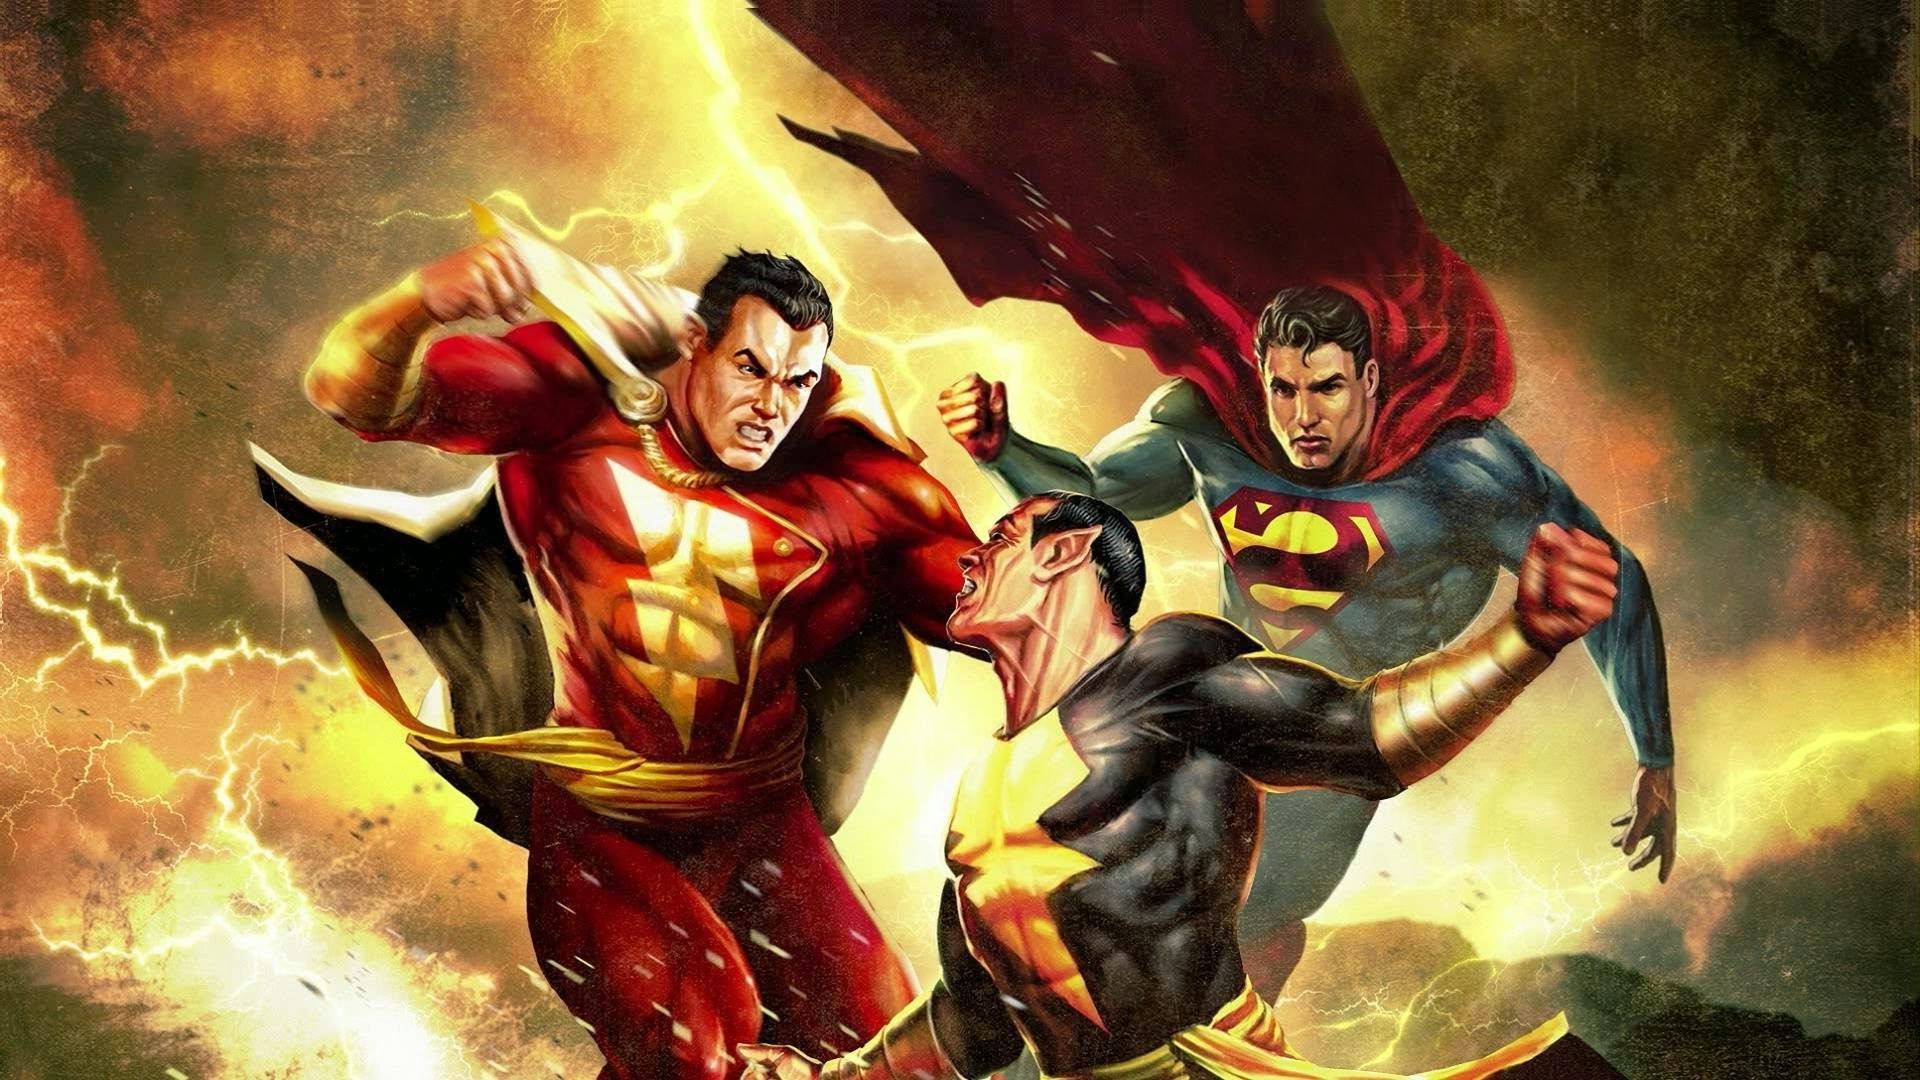 Supergirl Hd Wallpapers 1080p Shazam Vs Blackadam Vs Superman Comic Wallpaper